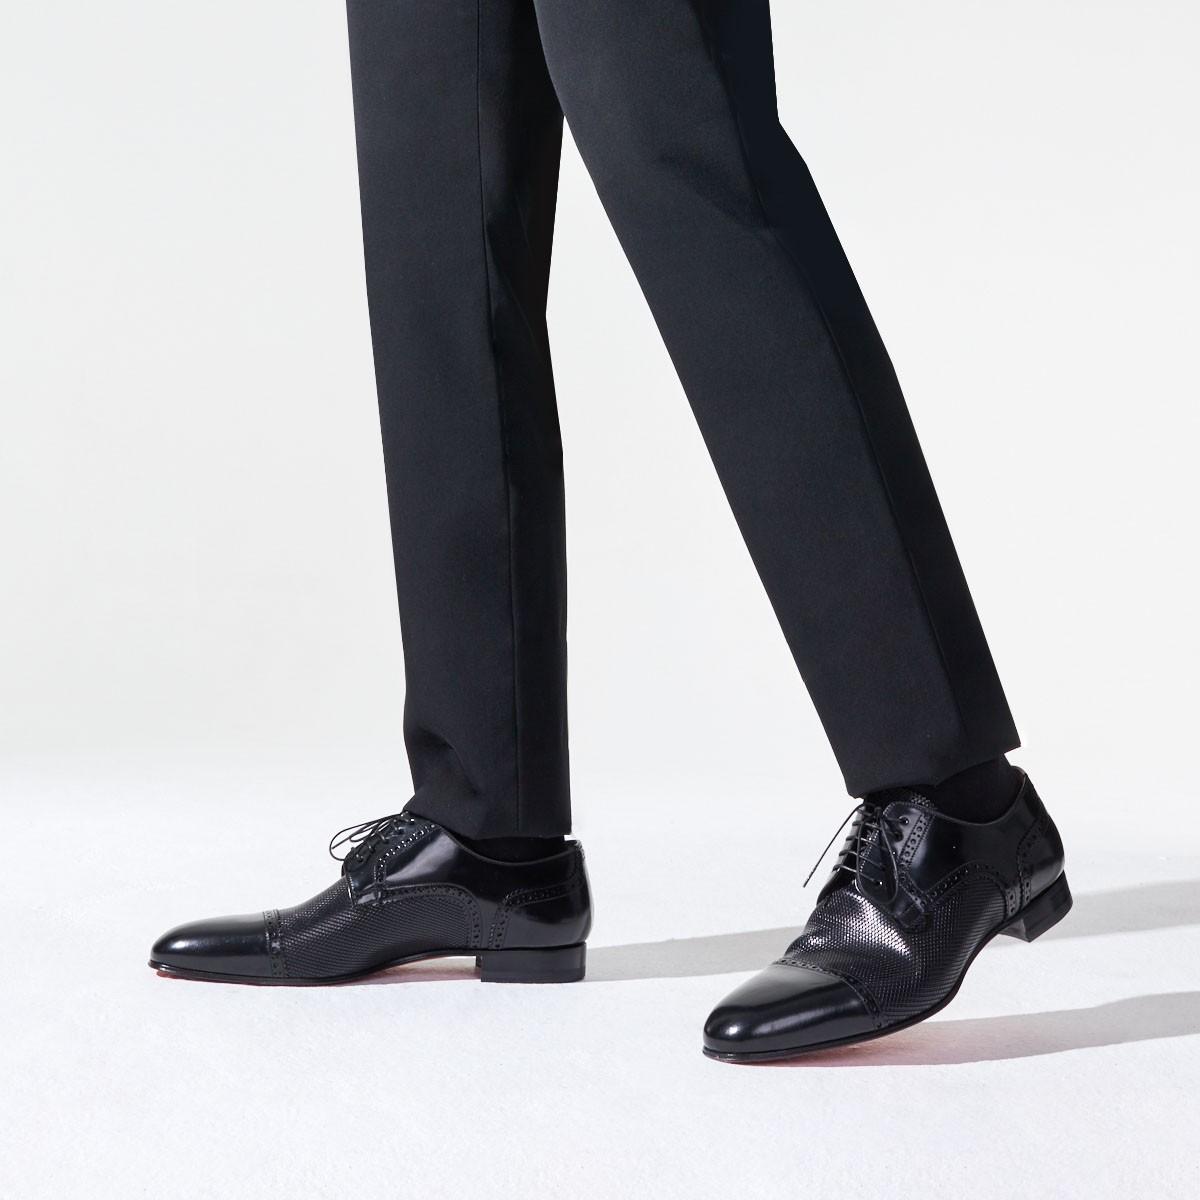 Men Shoes - Eygeny - Christian Louboutin